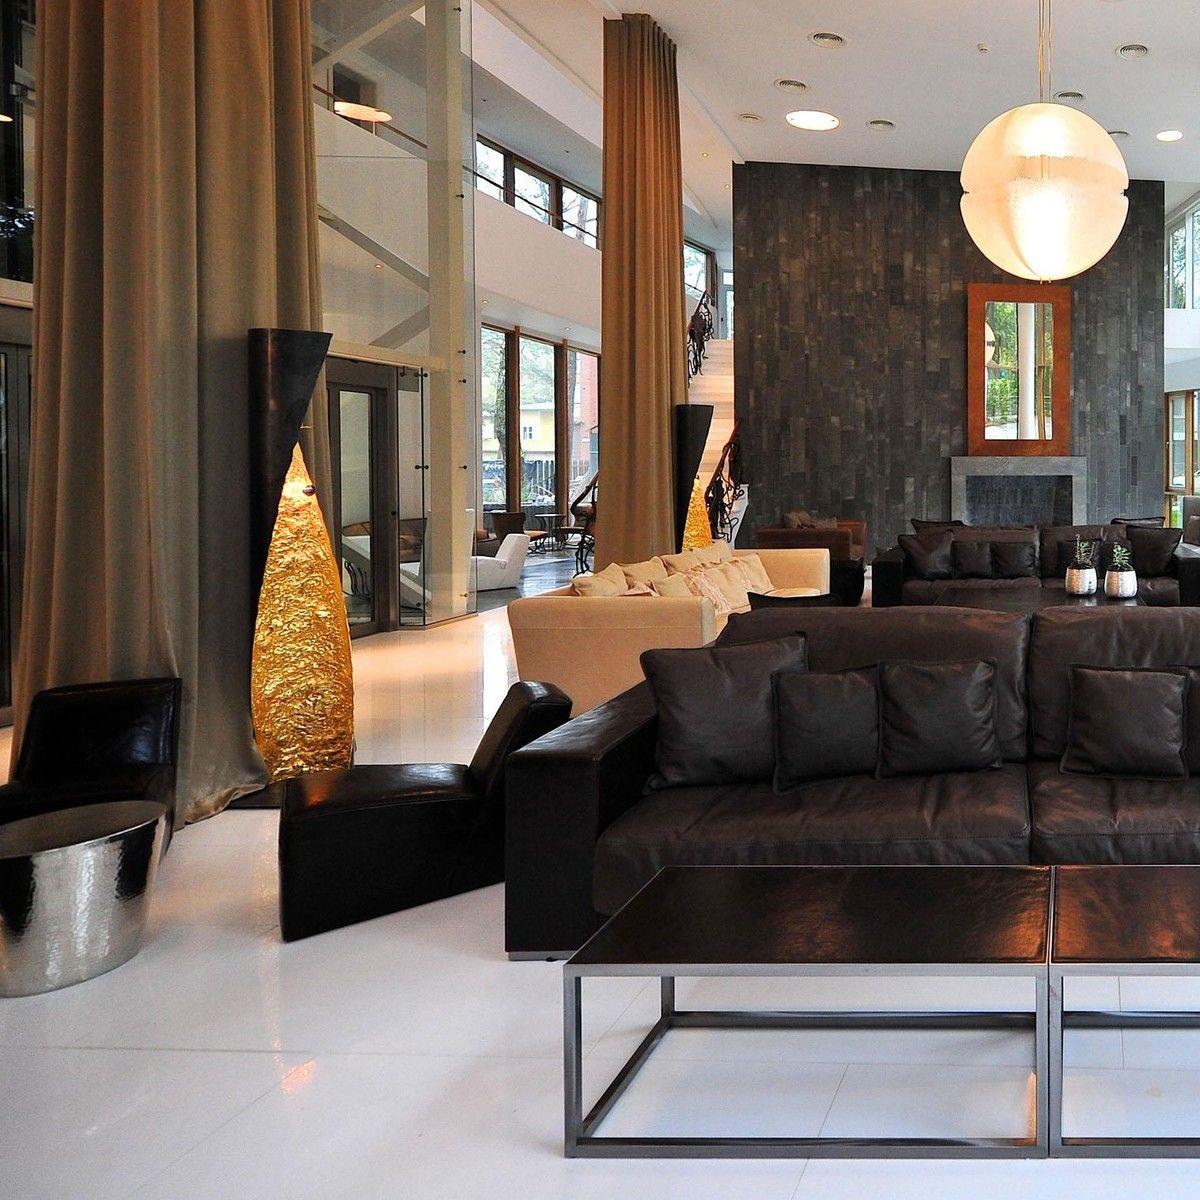 stchu moon 09 stehleuchte catellani smith. Black Bedroom Furniture Sets. Home Design Ideas